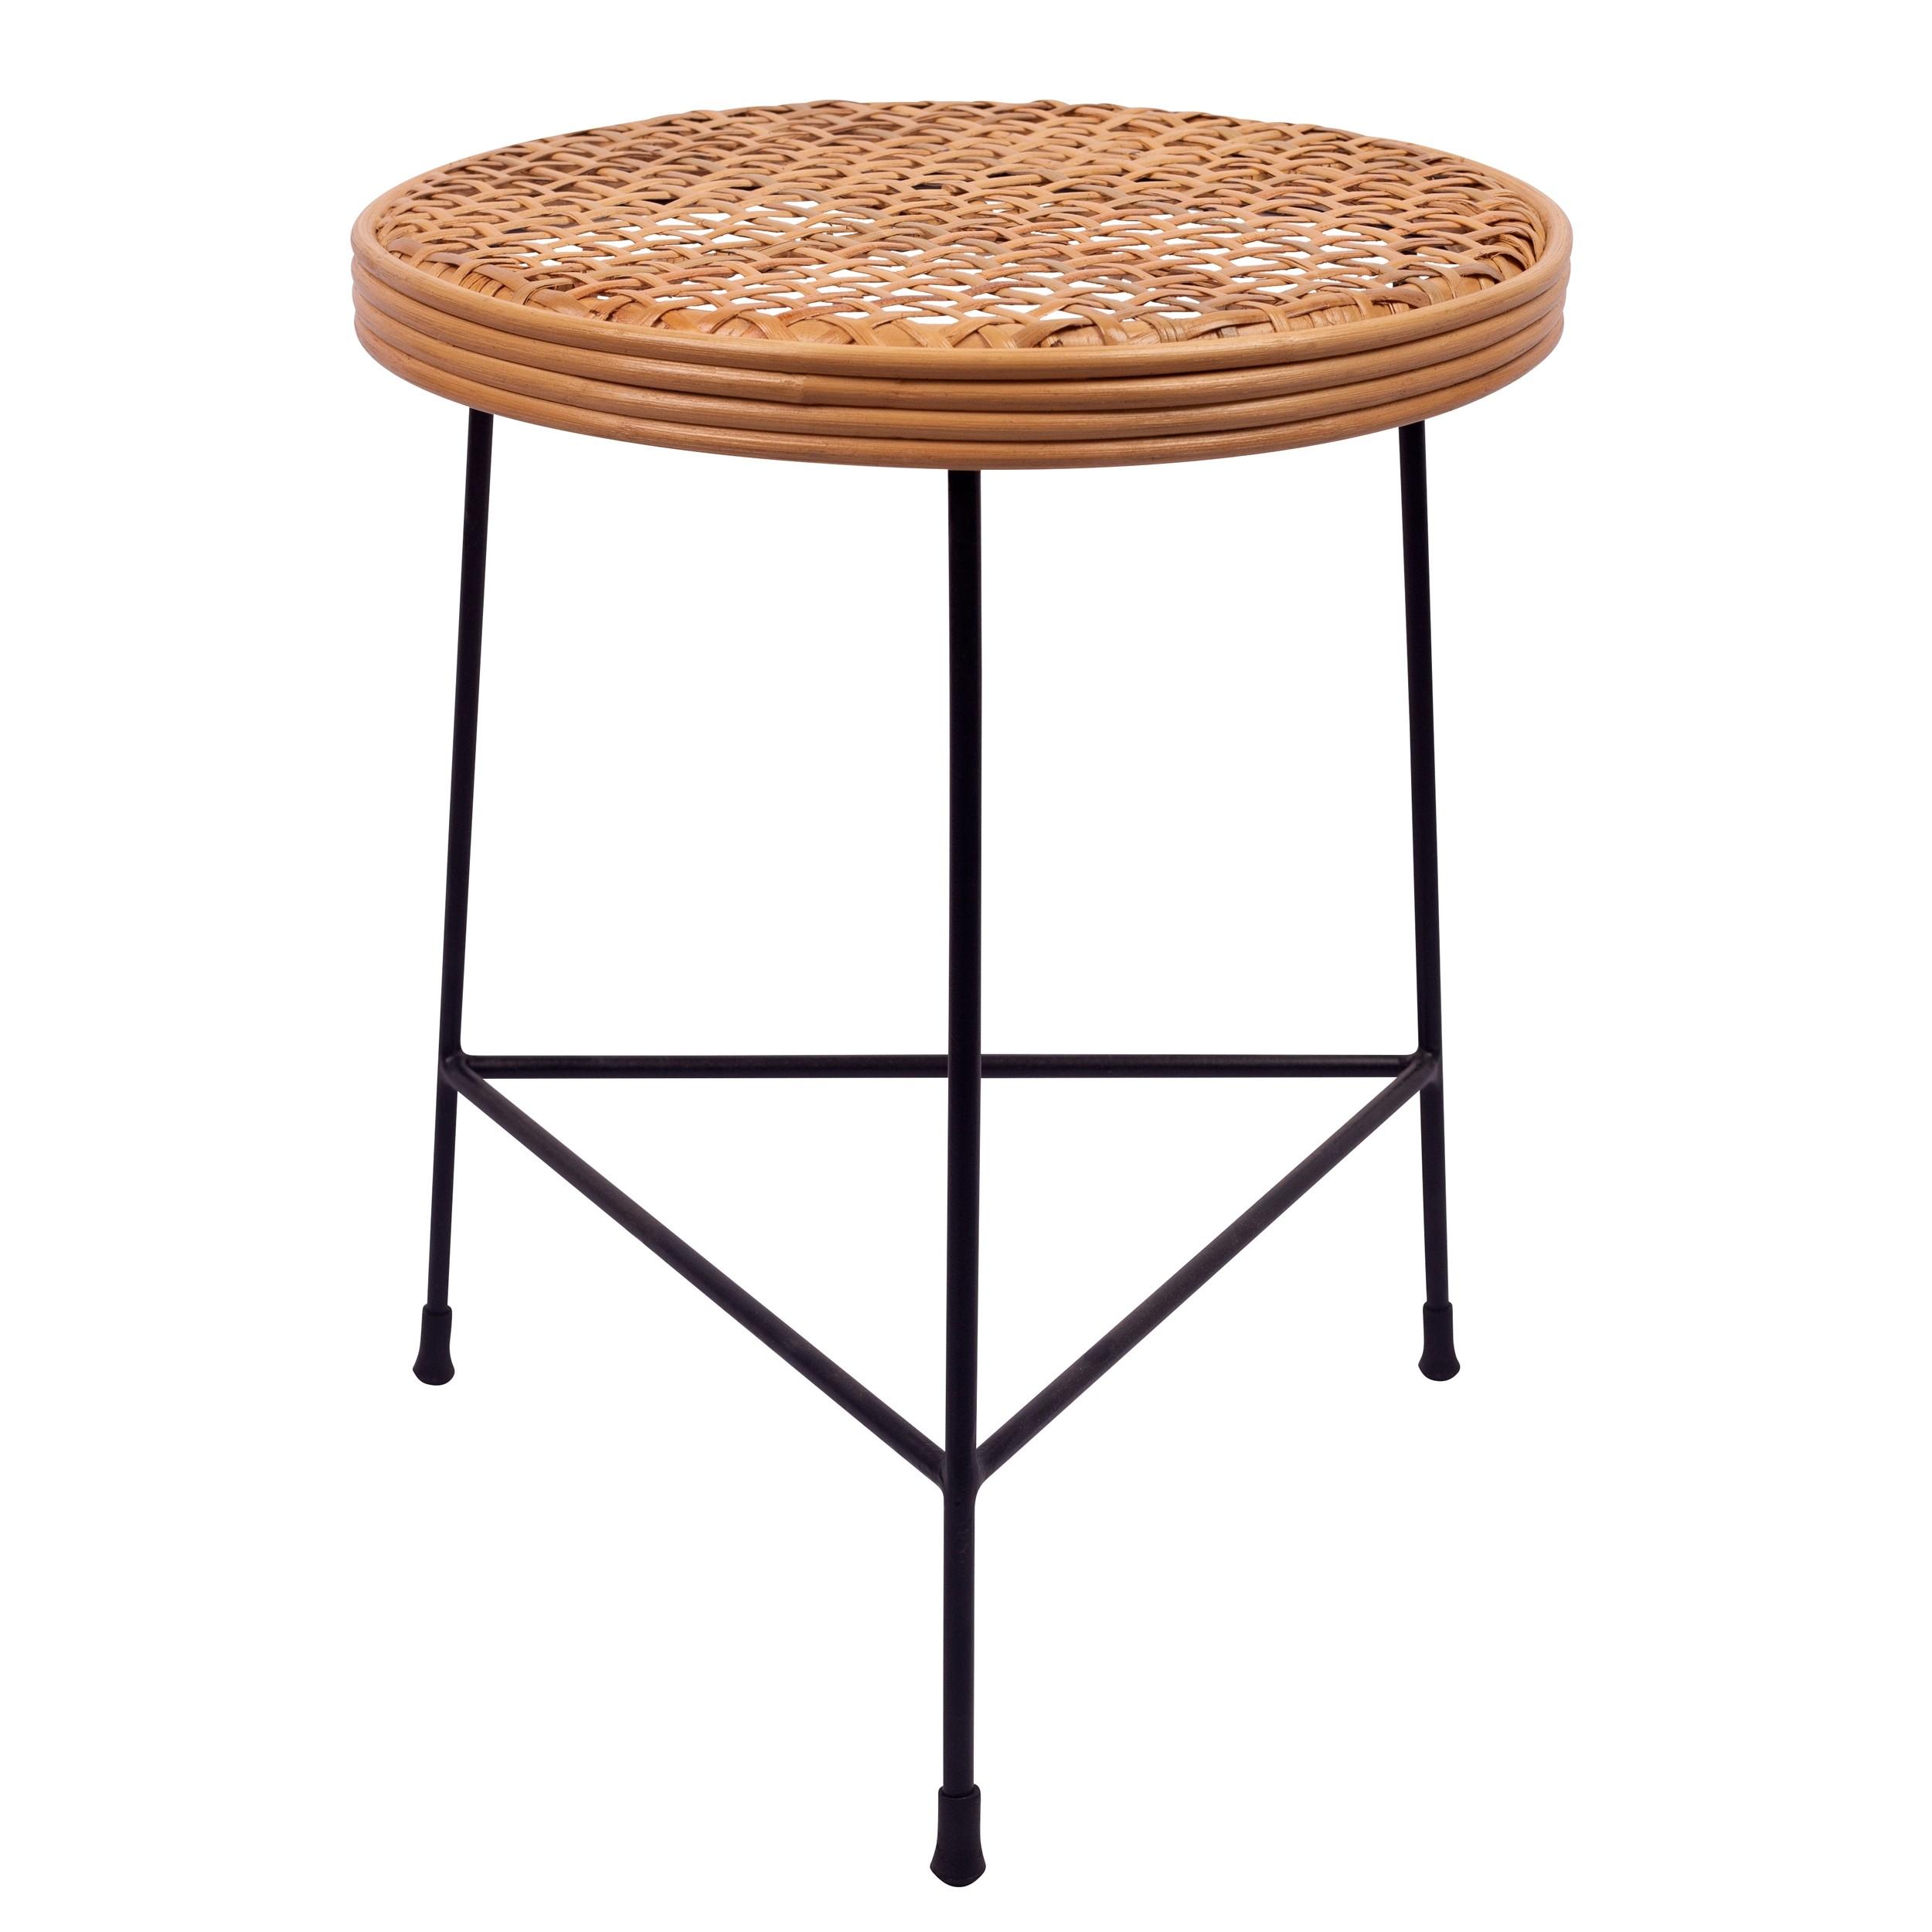 acheter table basse ronde en rotin et metal